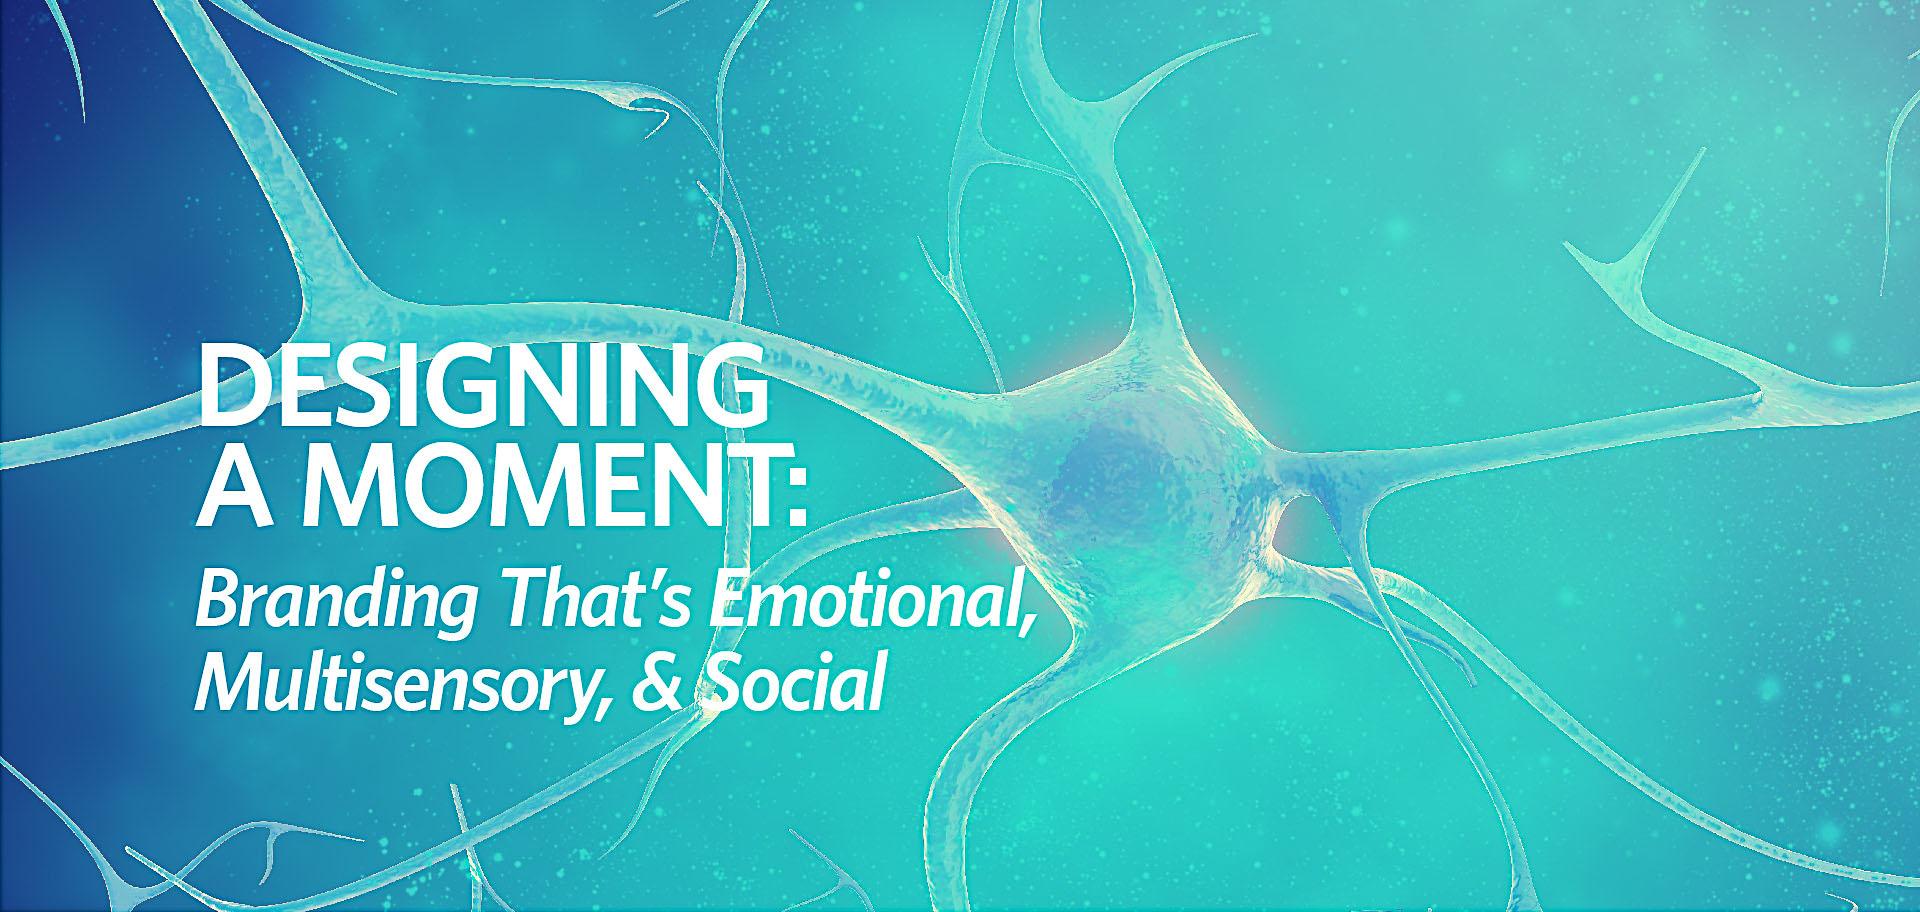 Designing a moment branding emotional multisensory social, Kettle Fire Creative blog moment Designing a Moment: Branding that's Emotional, Multisensory, Social fi